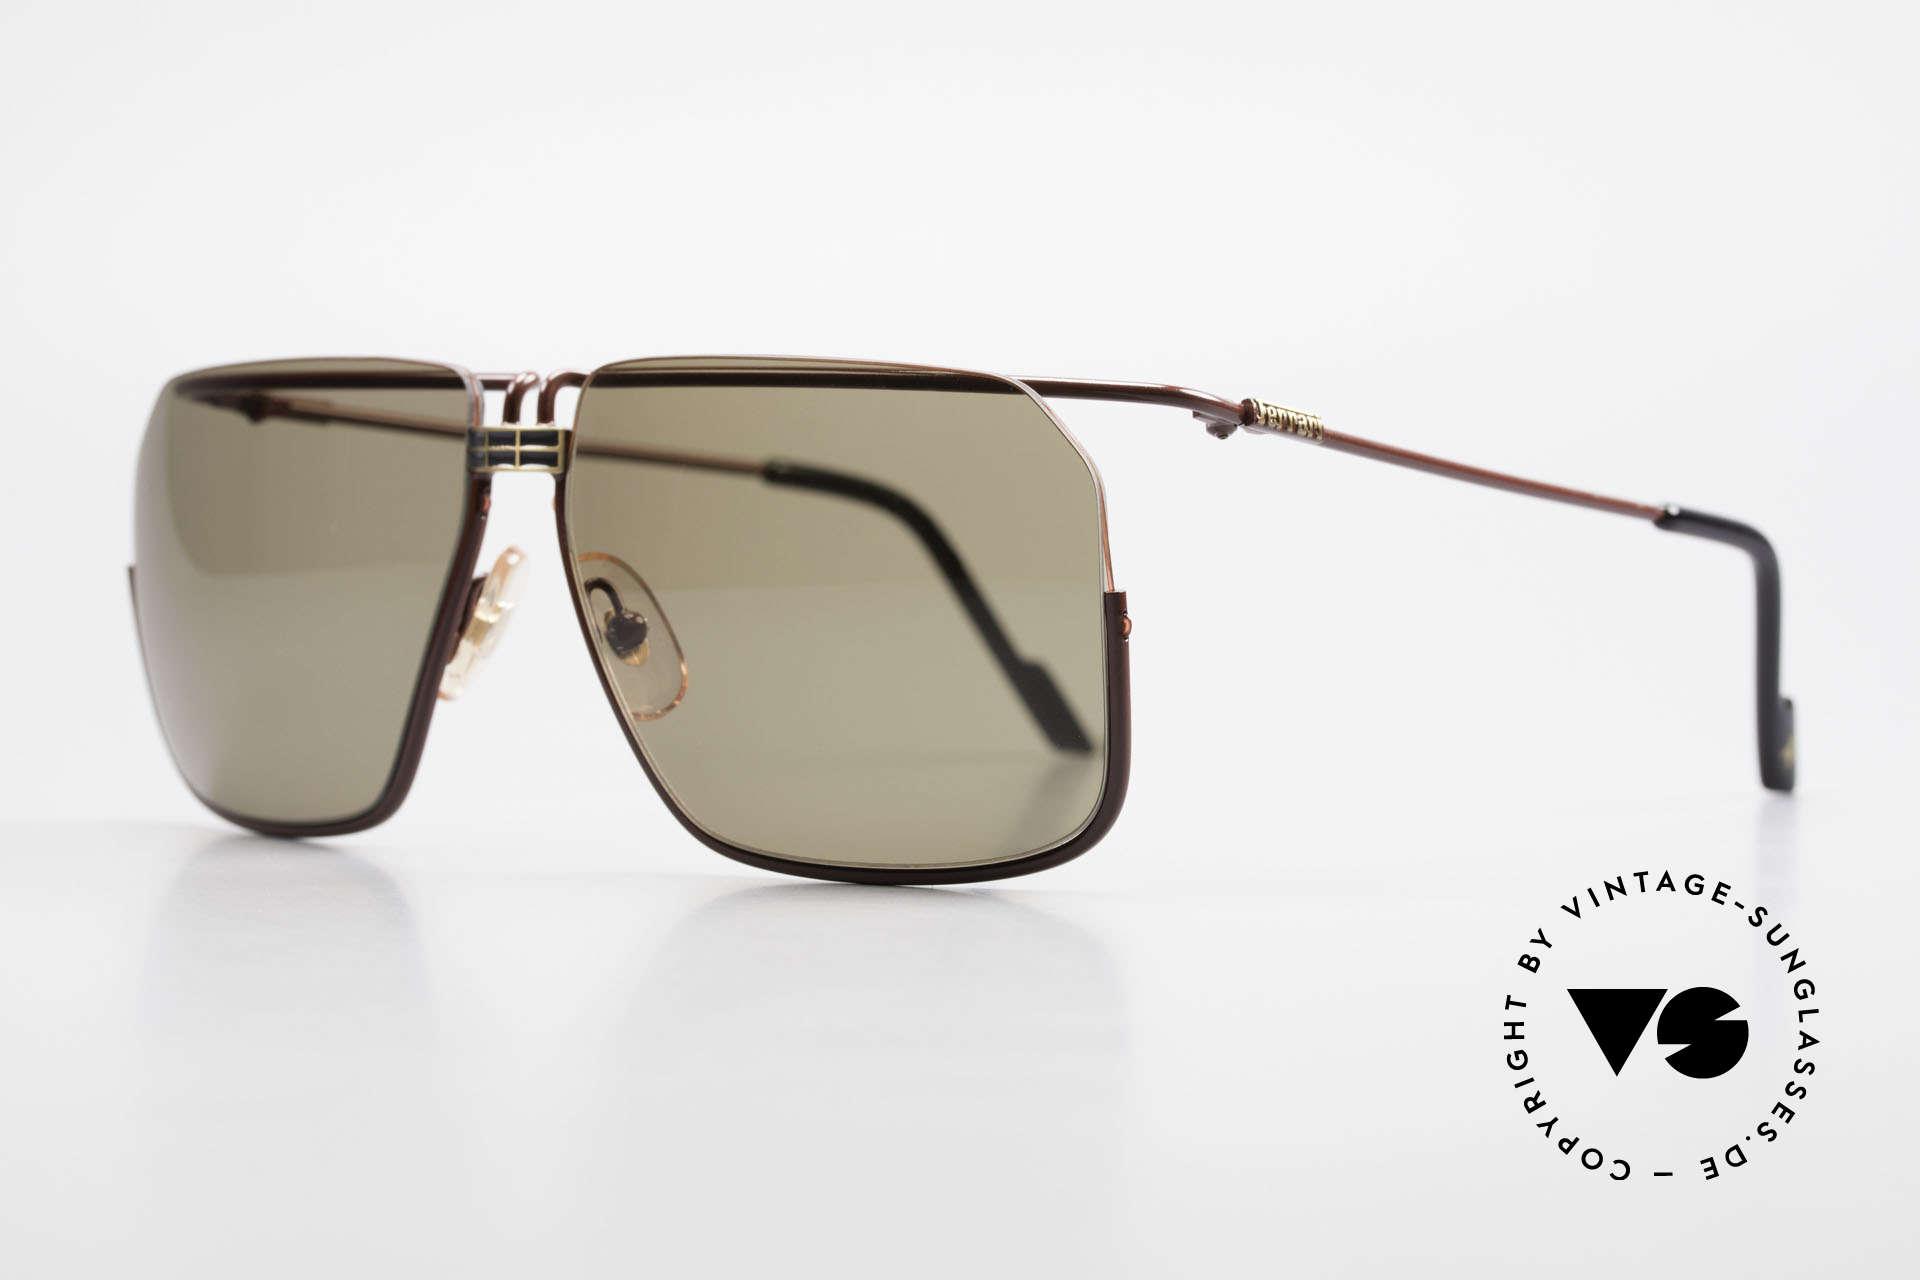 Ferrari F18/S Ferrari Formula 1 Sunglasses, finest quality (100% UV) & superior materials from Italy, Made for Men